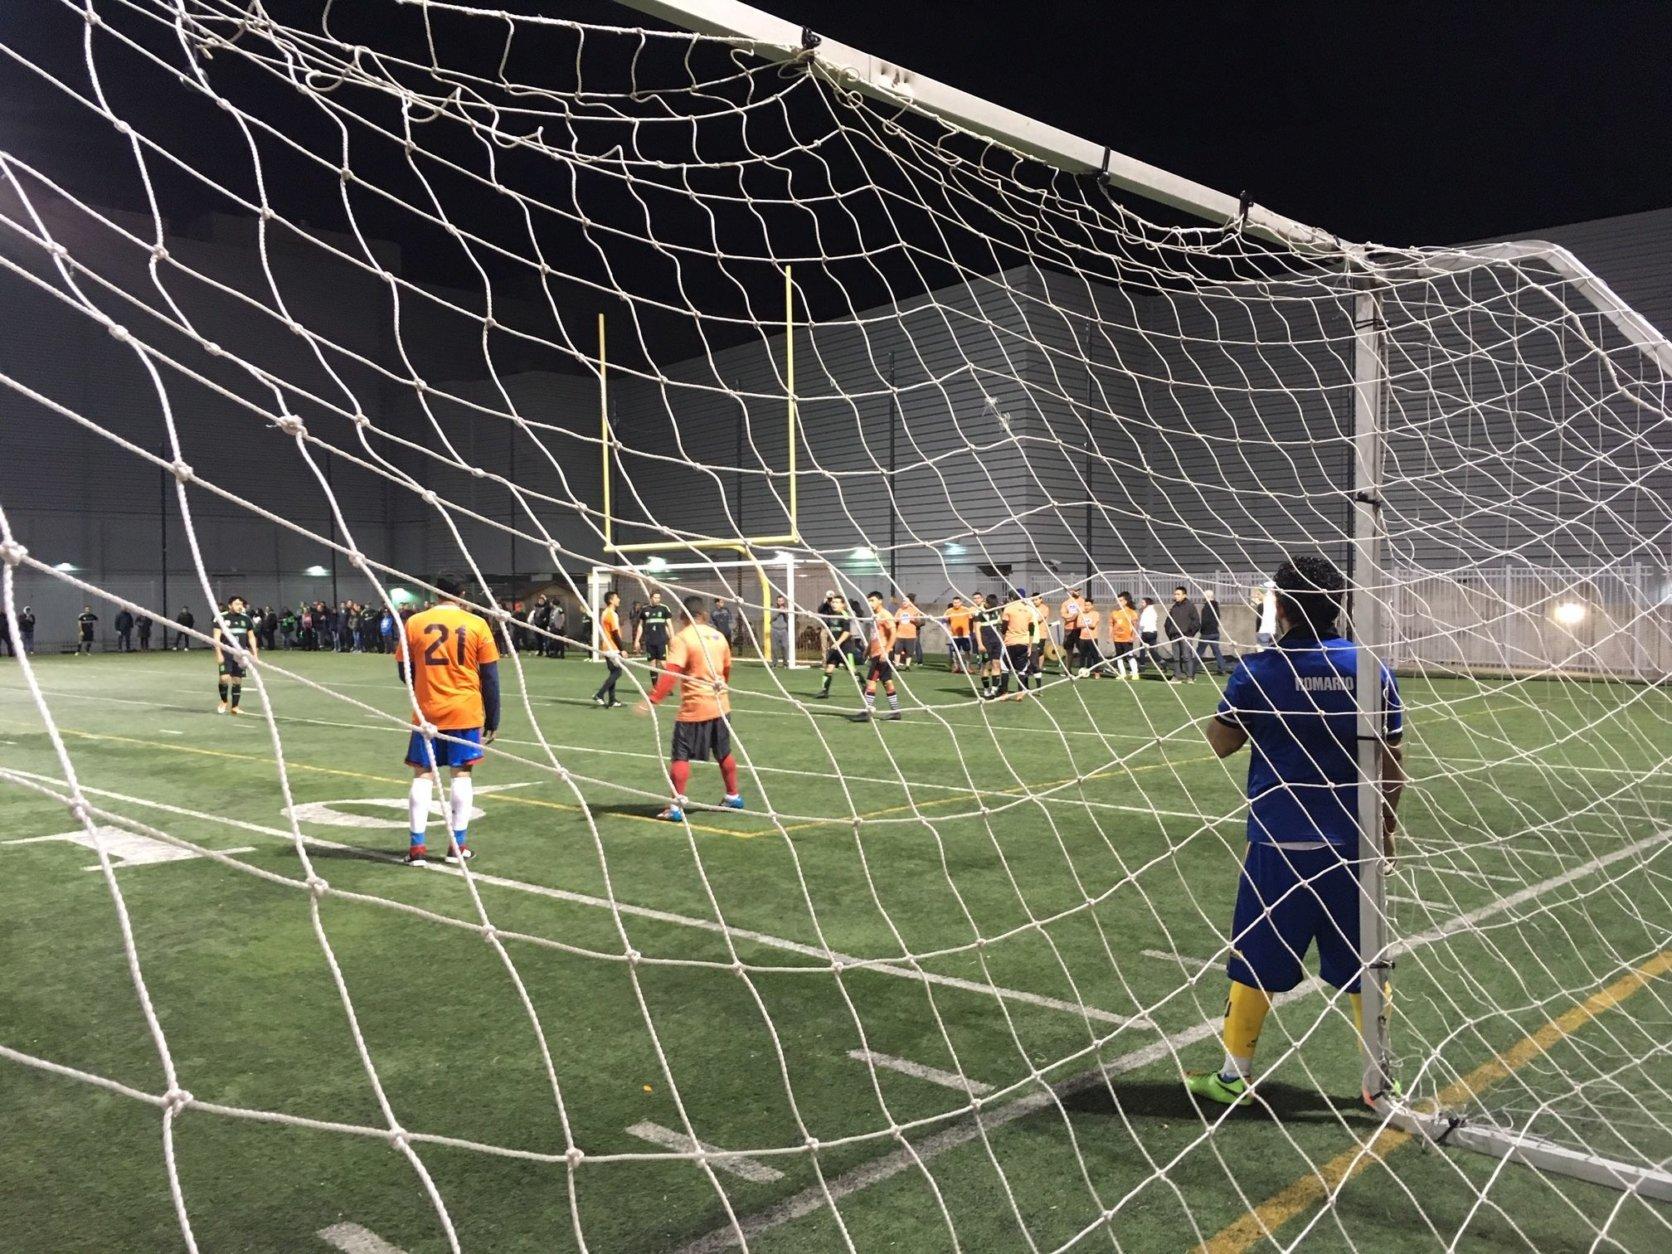 Team Oyamel awaits a free kick in the annual ThinkFoodGroup Copa soccer tournament between chef José Andrés's D.C. area restaurants. (WTOP/Noah Frank)